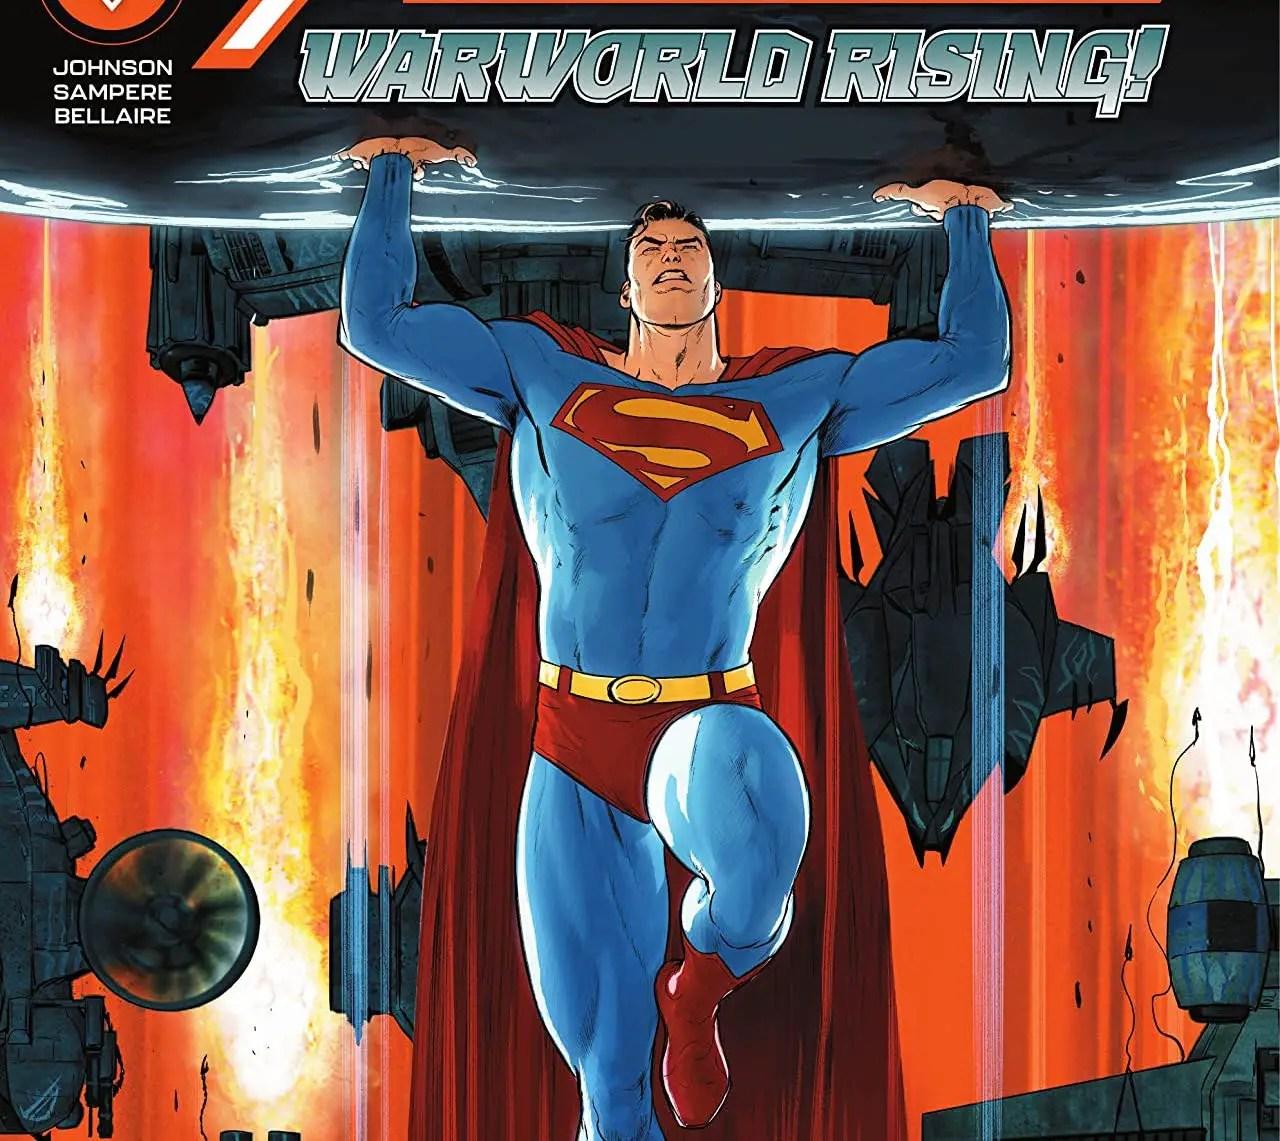 'Action Comics' #1030 balances Superman's life well